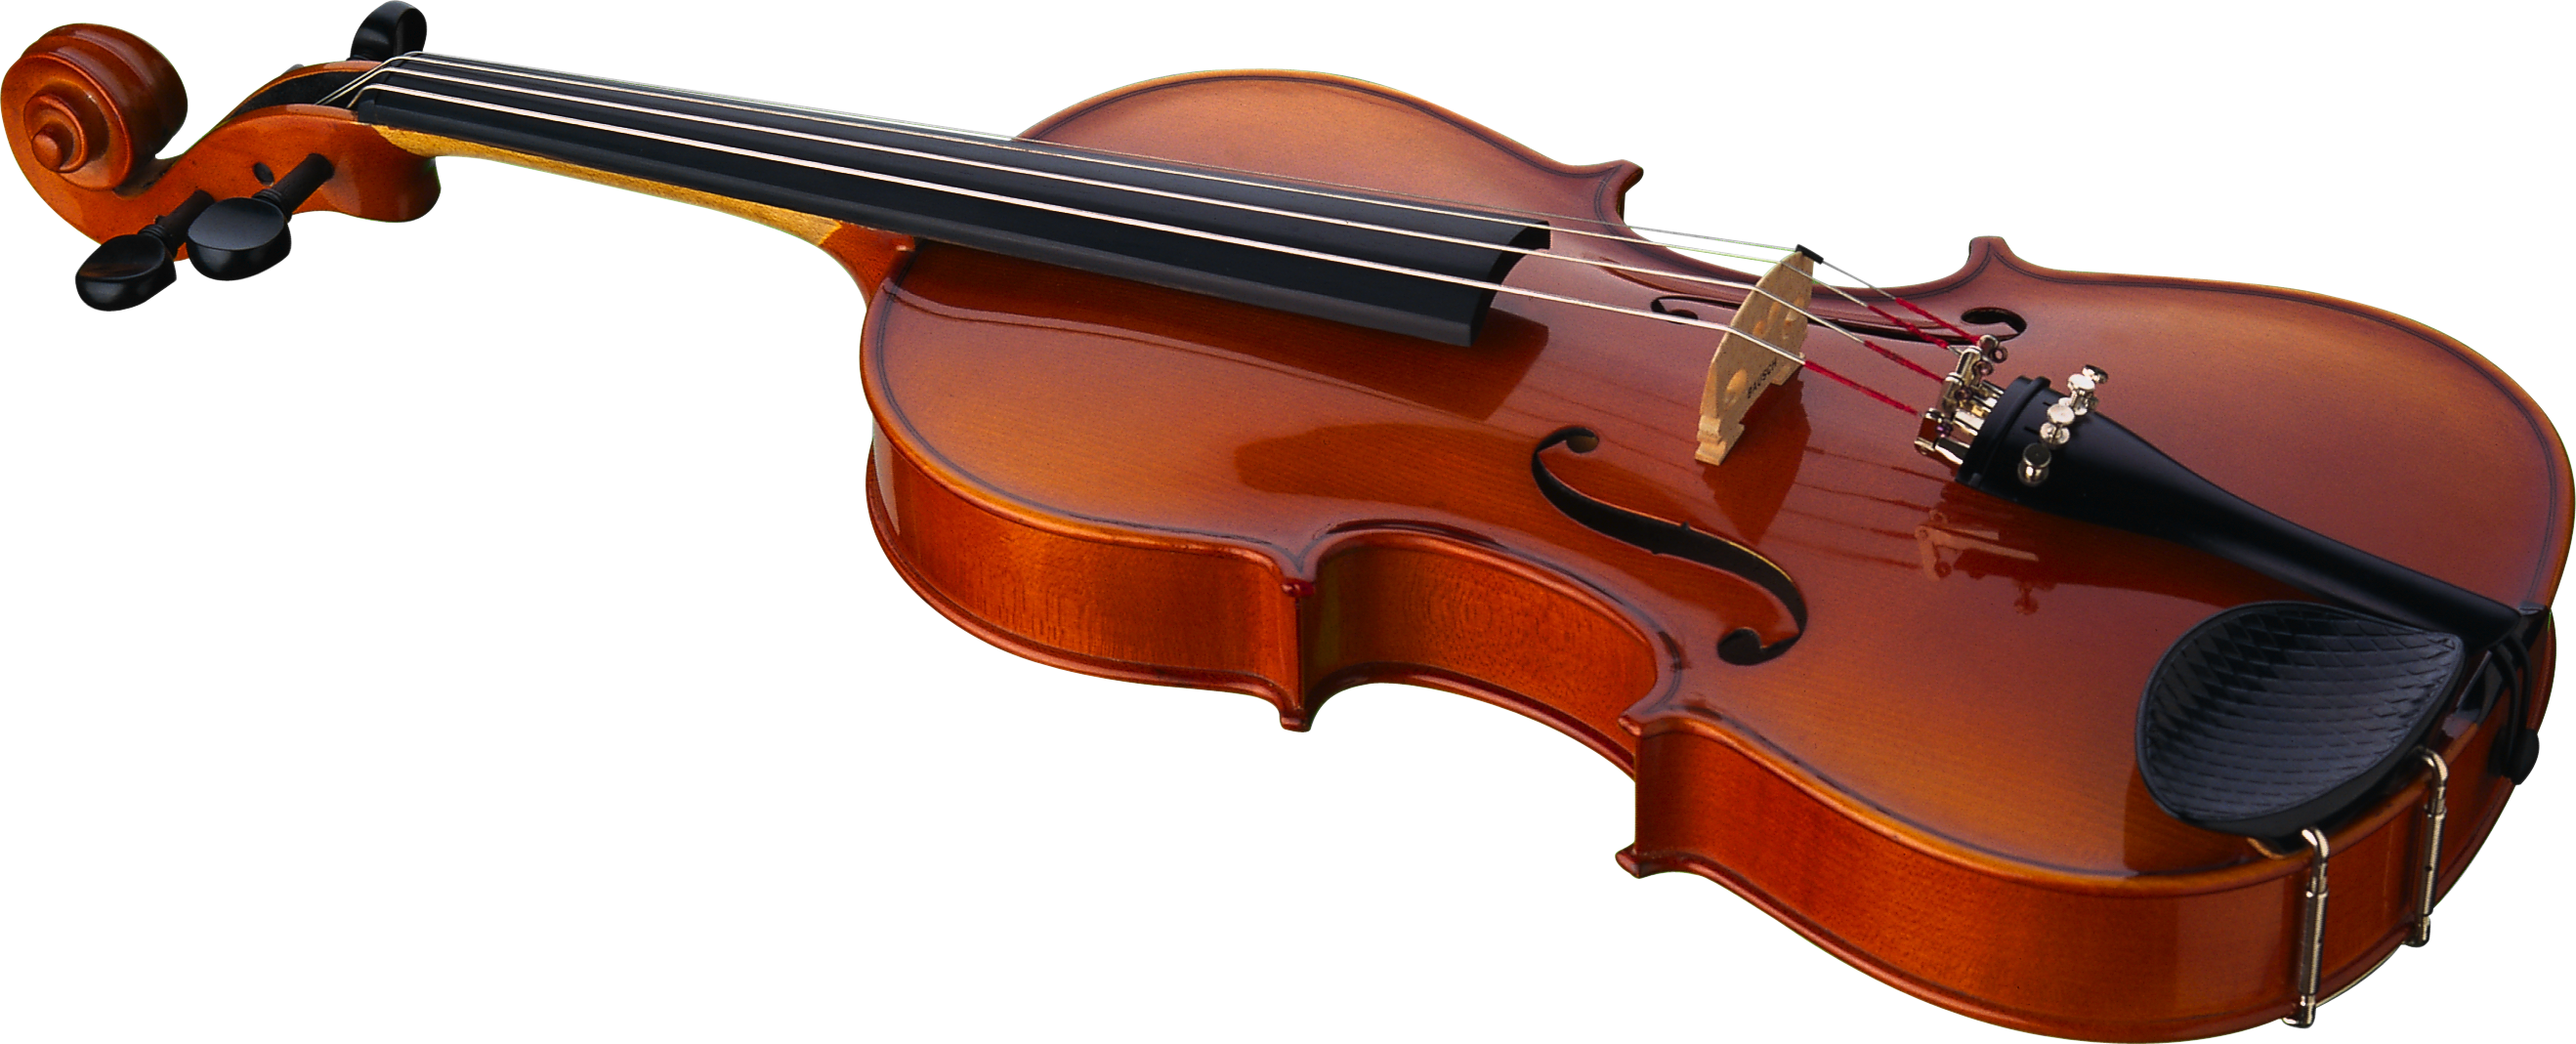 Download Violin Bow Png Image For Free Violin Violin Bow Png